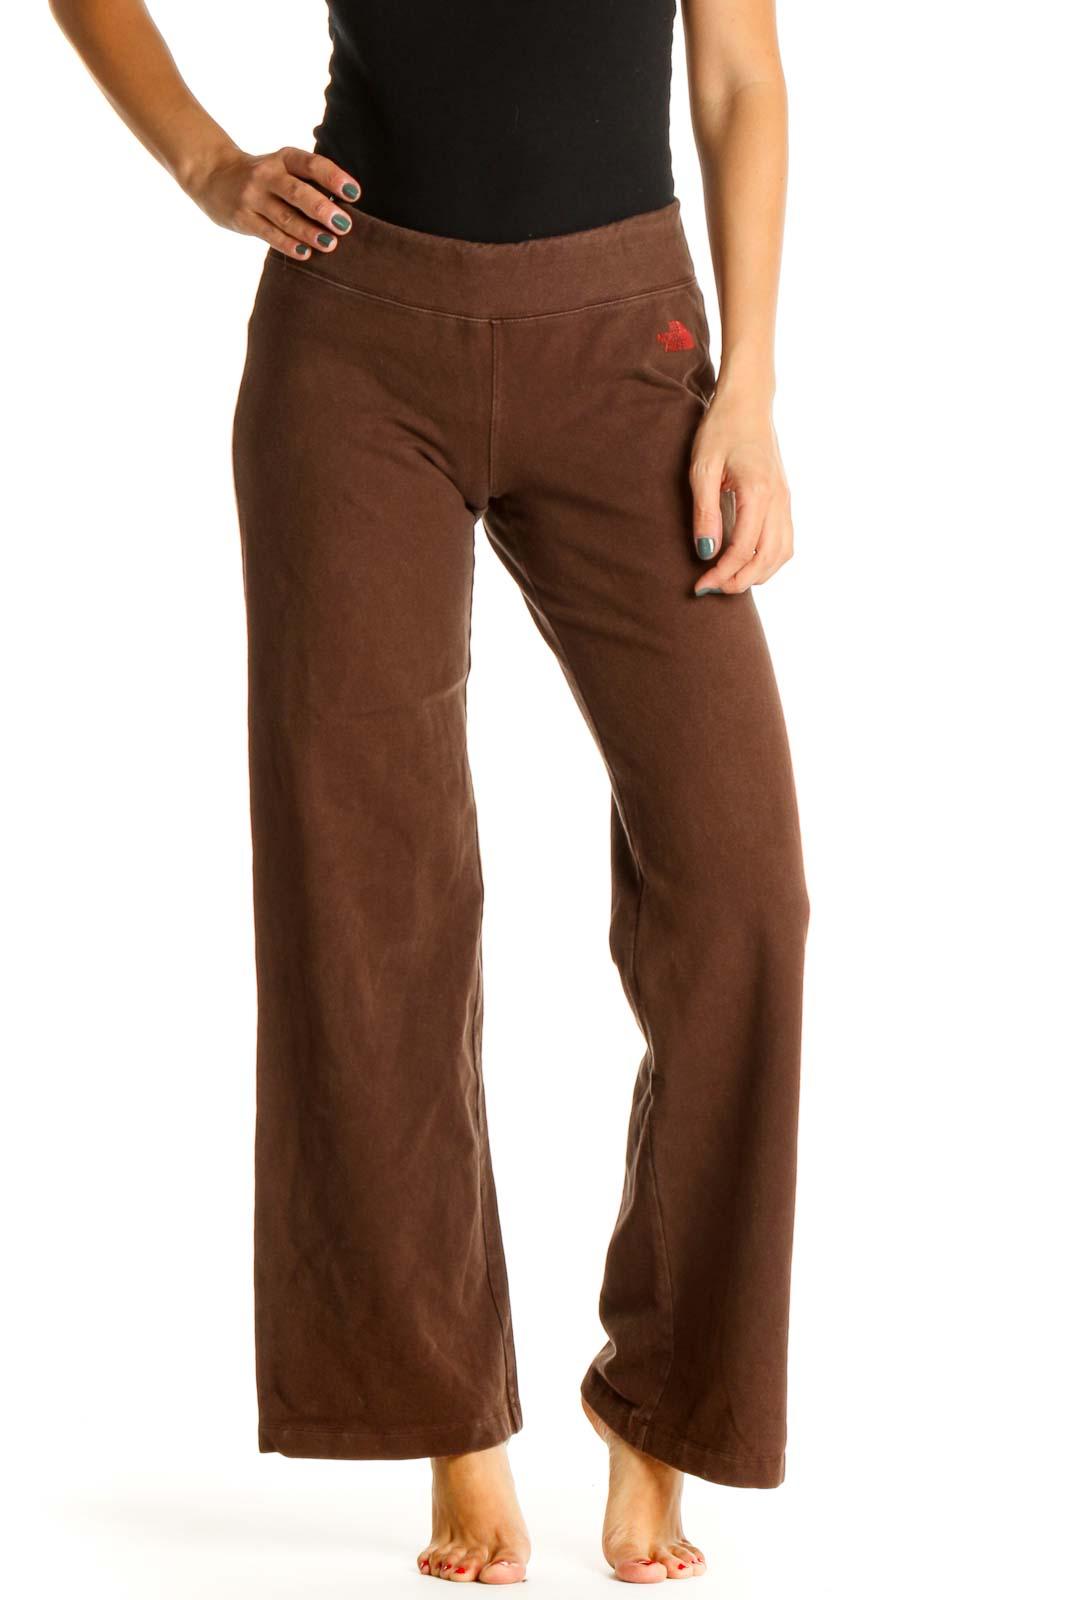 Brown Solid Activewear Sweatpants Front